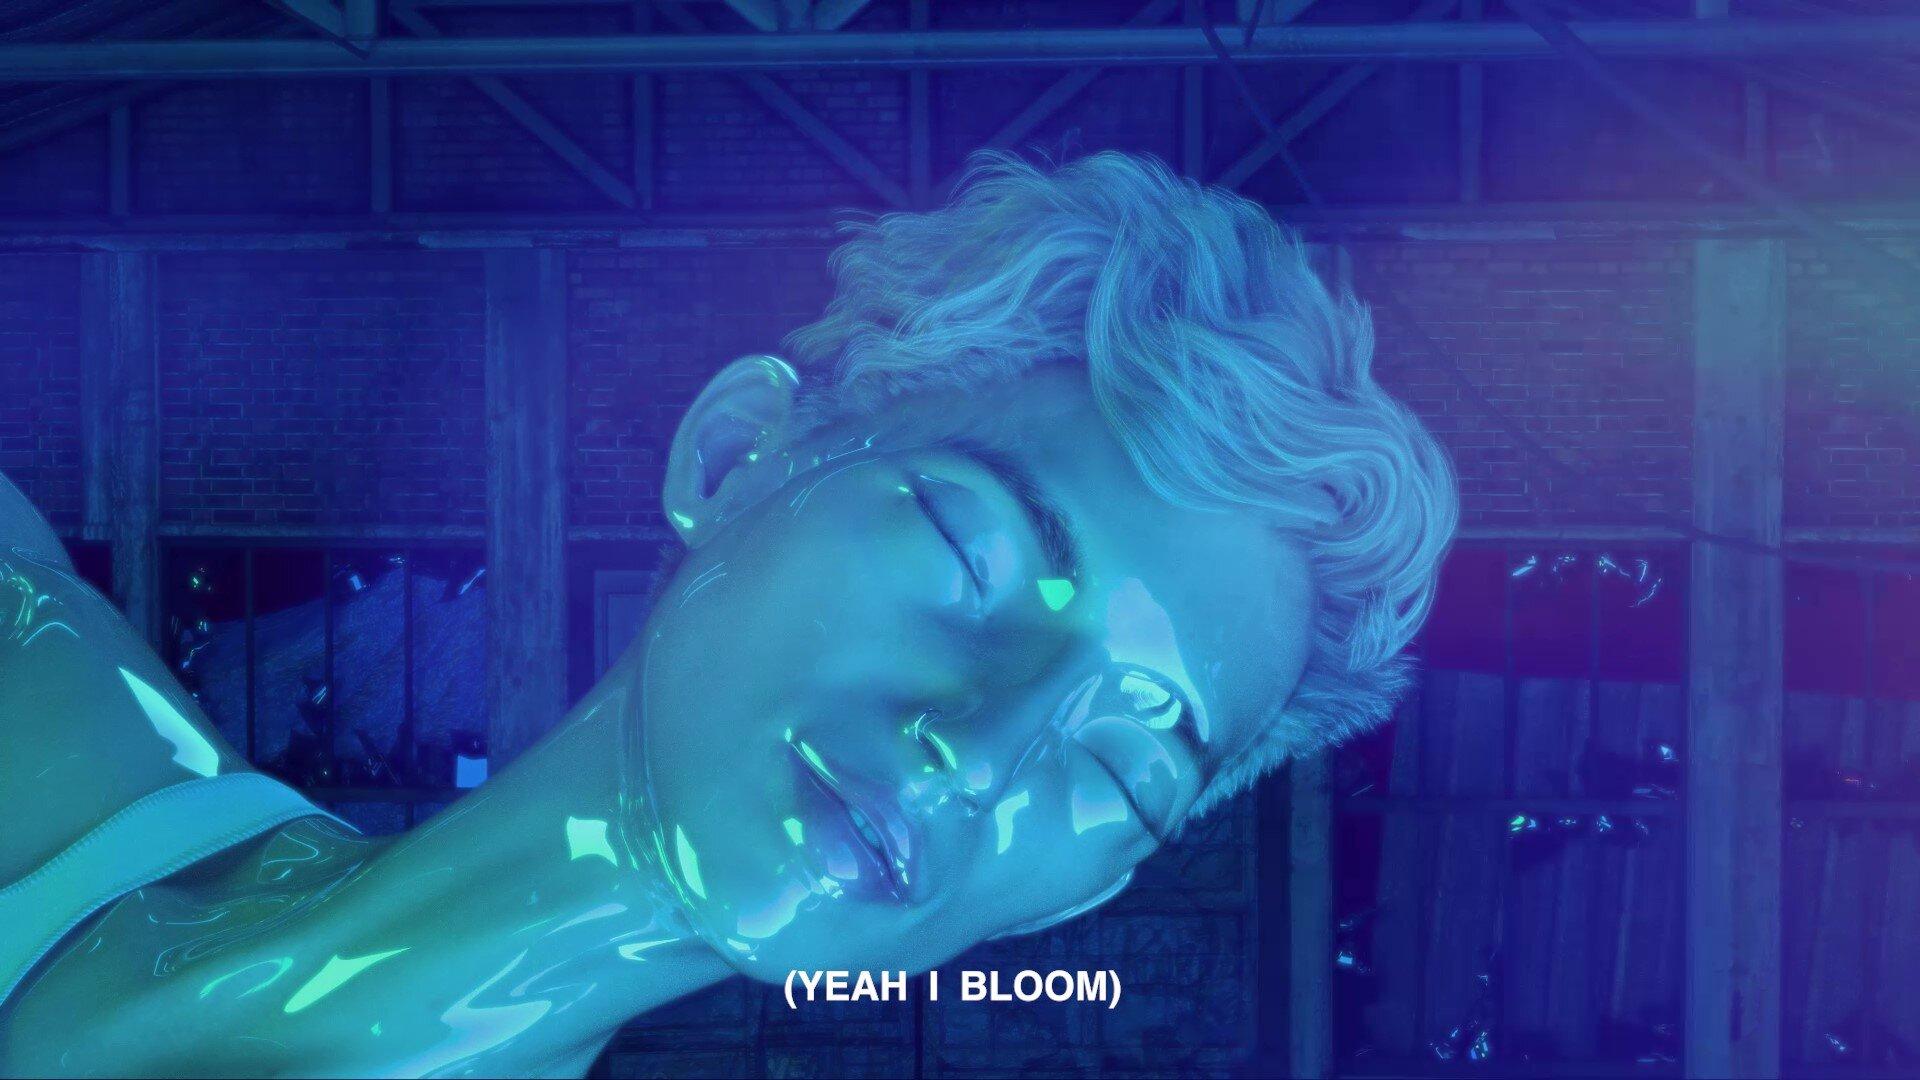 TroyeSivan_BloomLyricJasonEbeyerUPDATED_Moment2.jpg